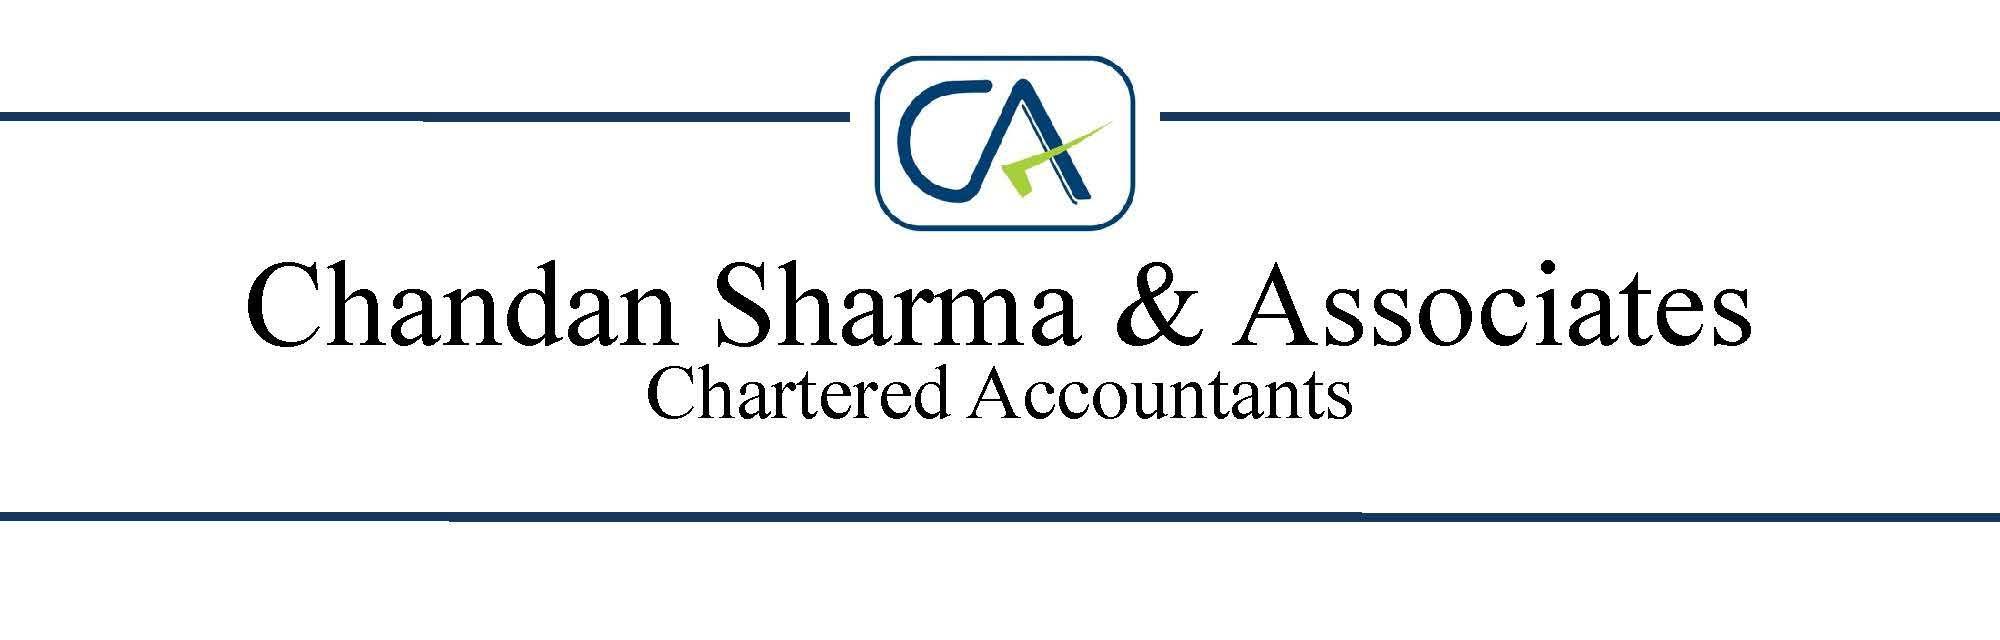 Chandan Sharma & Associates